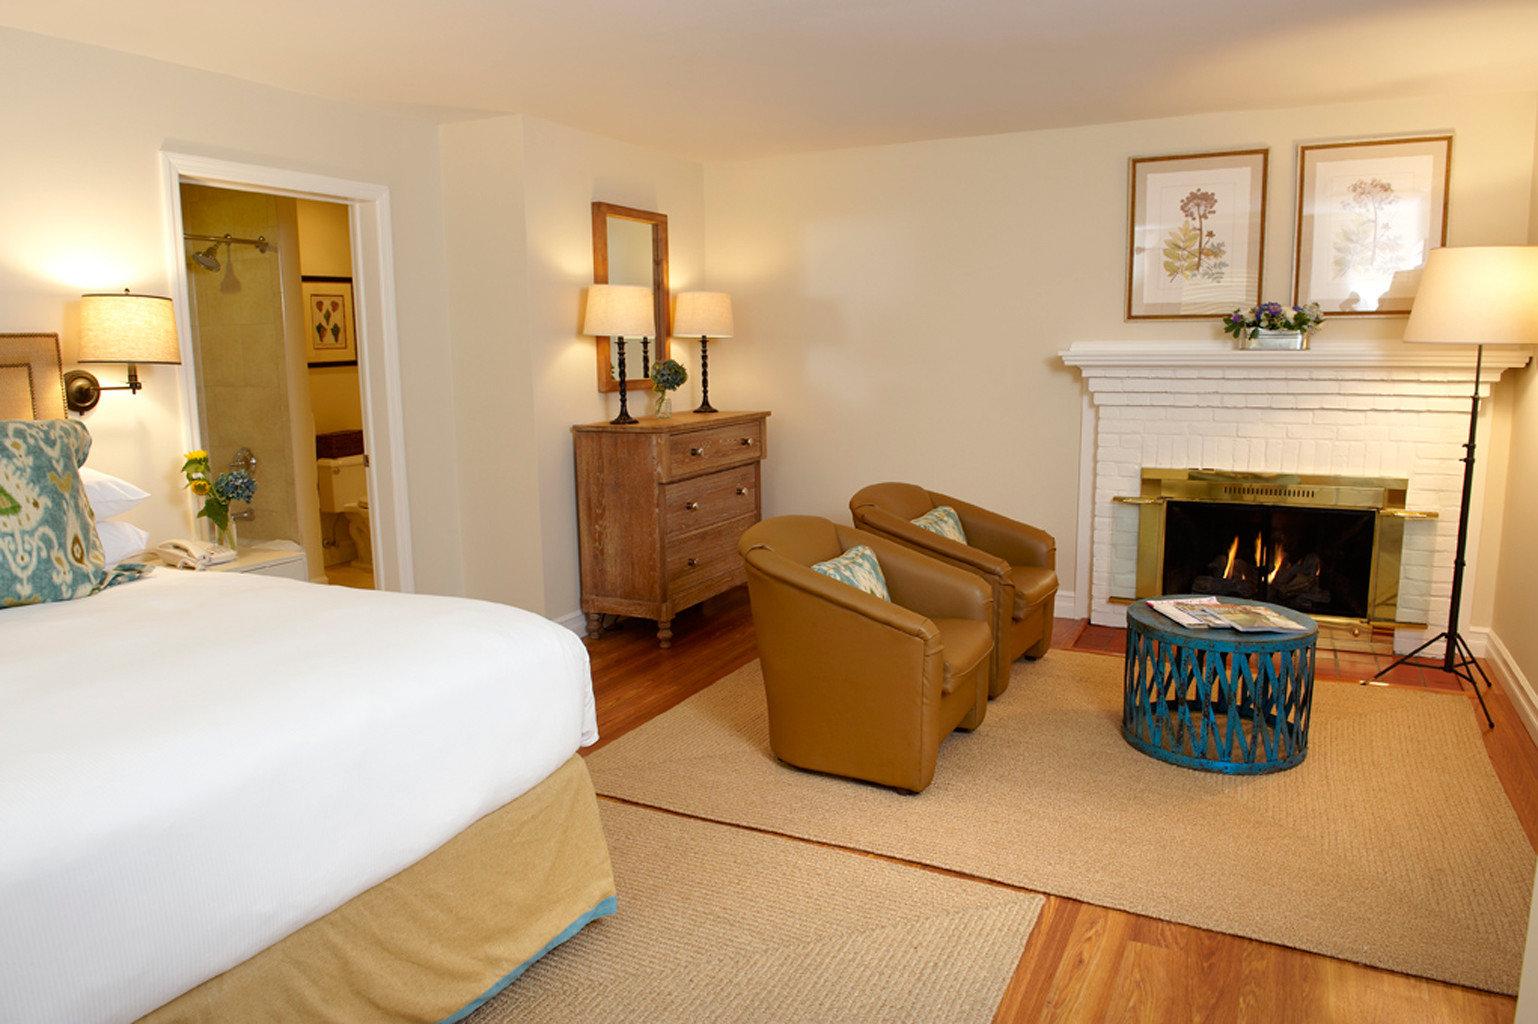 Bedroom Country Fireplace Inn property Suite cottage home hardwood Villa living room